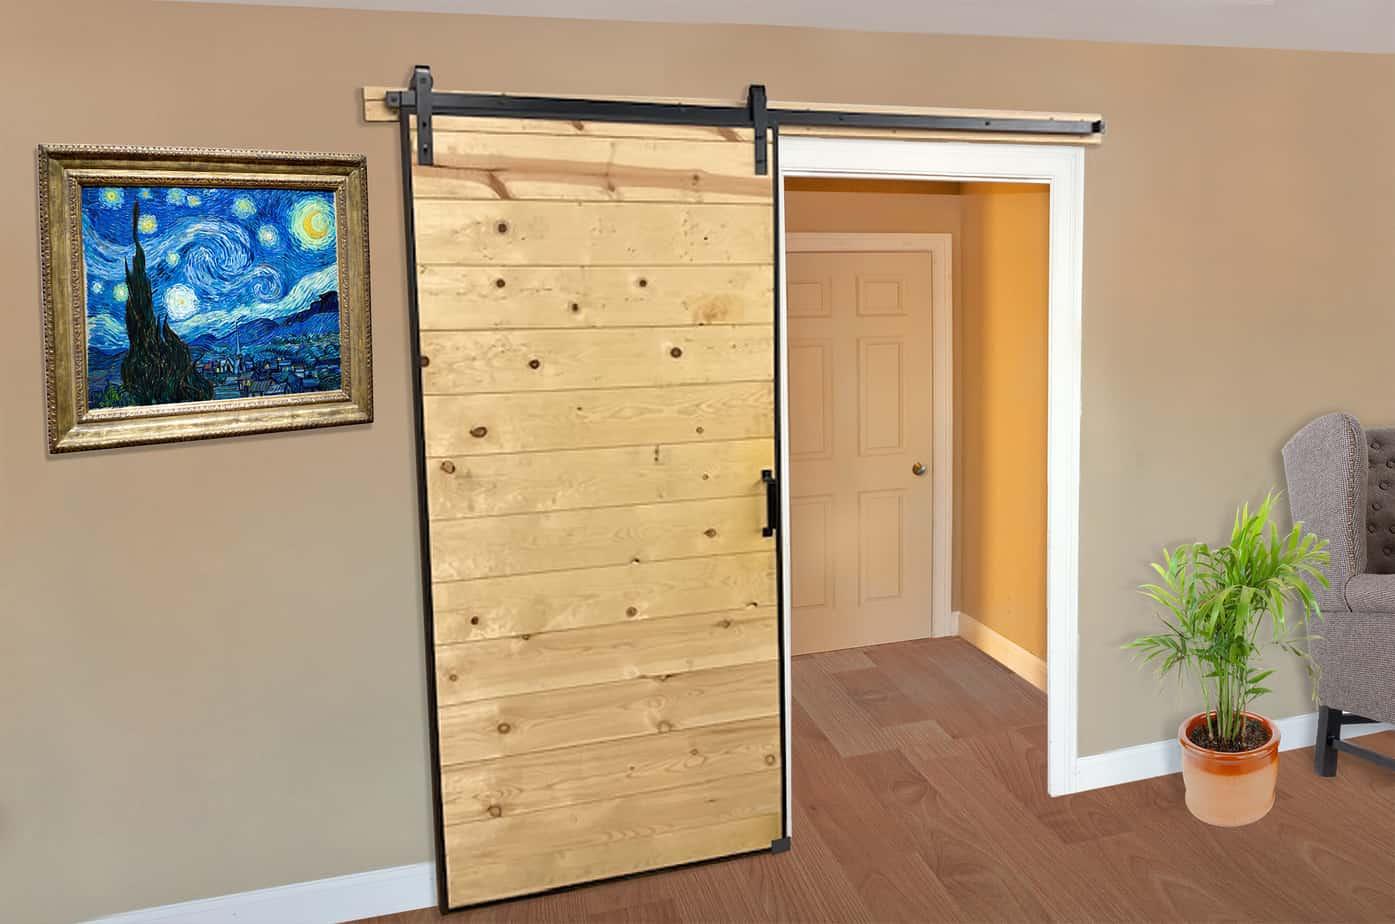 A wooden barn door style sliding door mounted on a home interior pass through